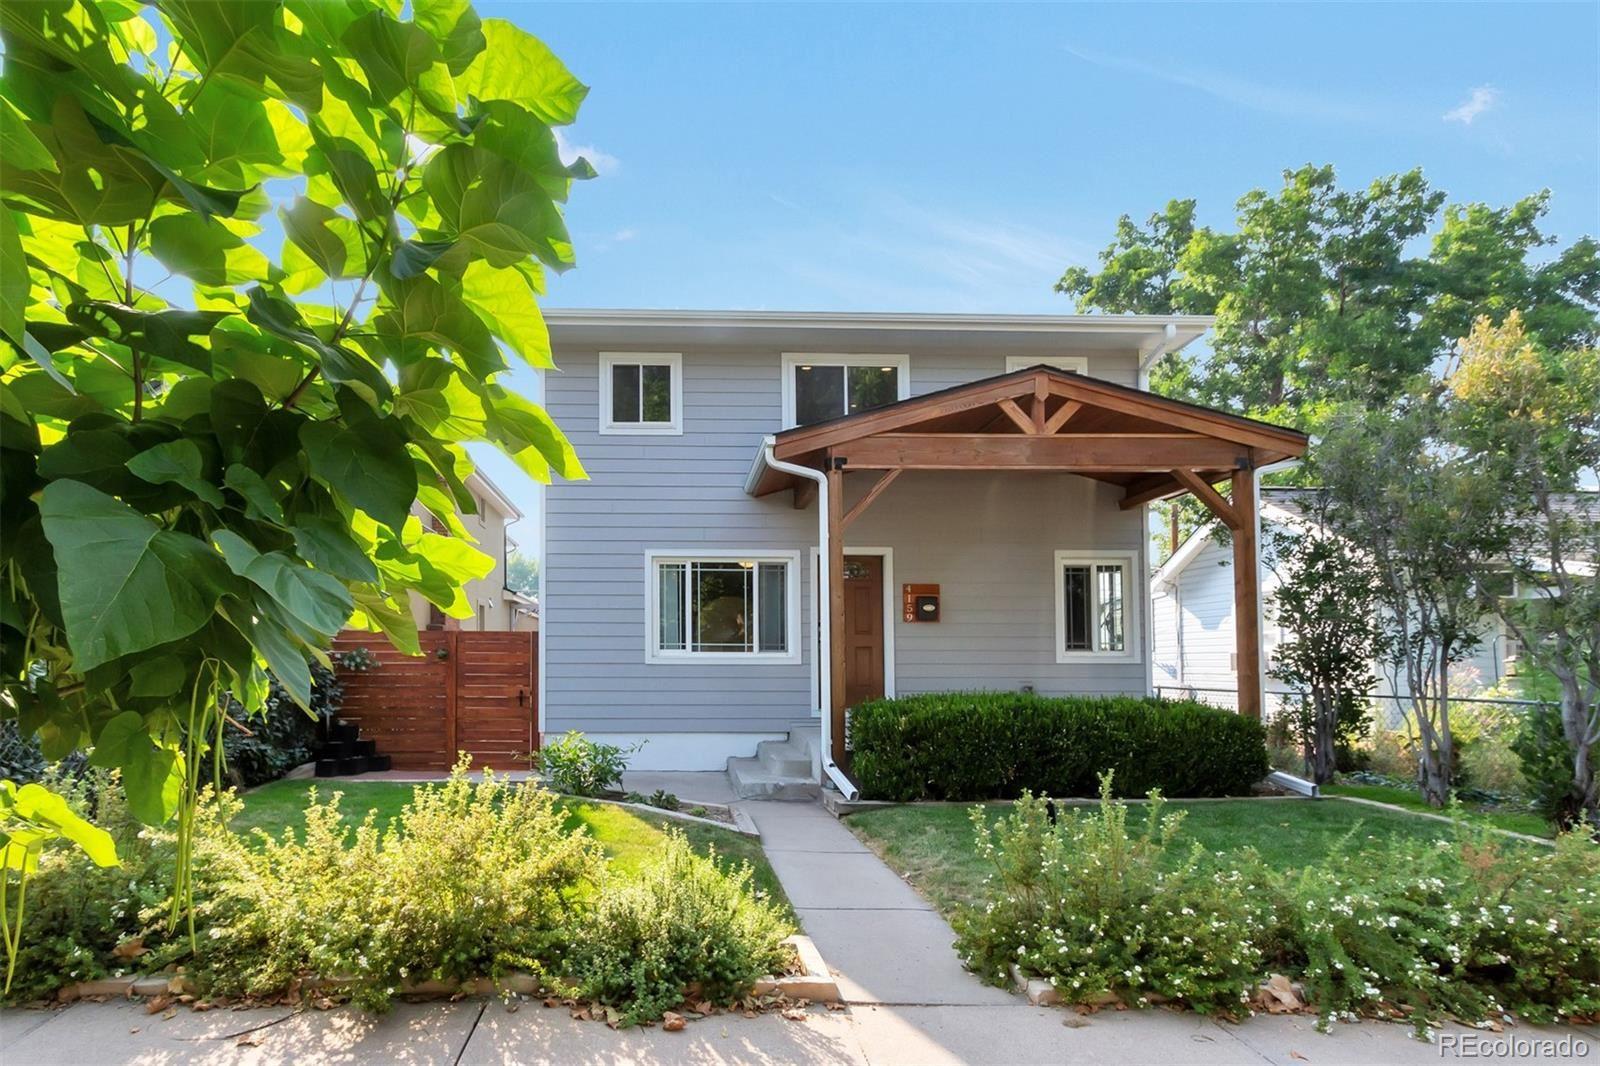 Photo of 4159 Zenobia Street, Denver, CO 80212 (MLS # 3970038)